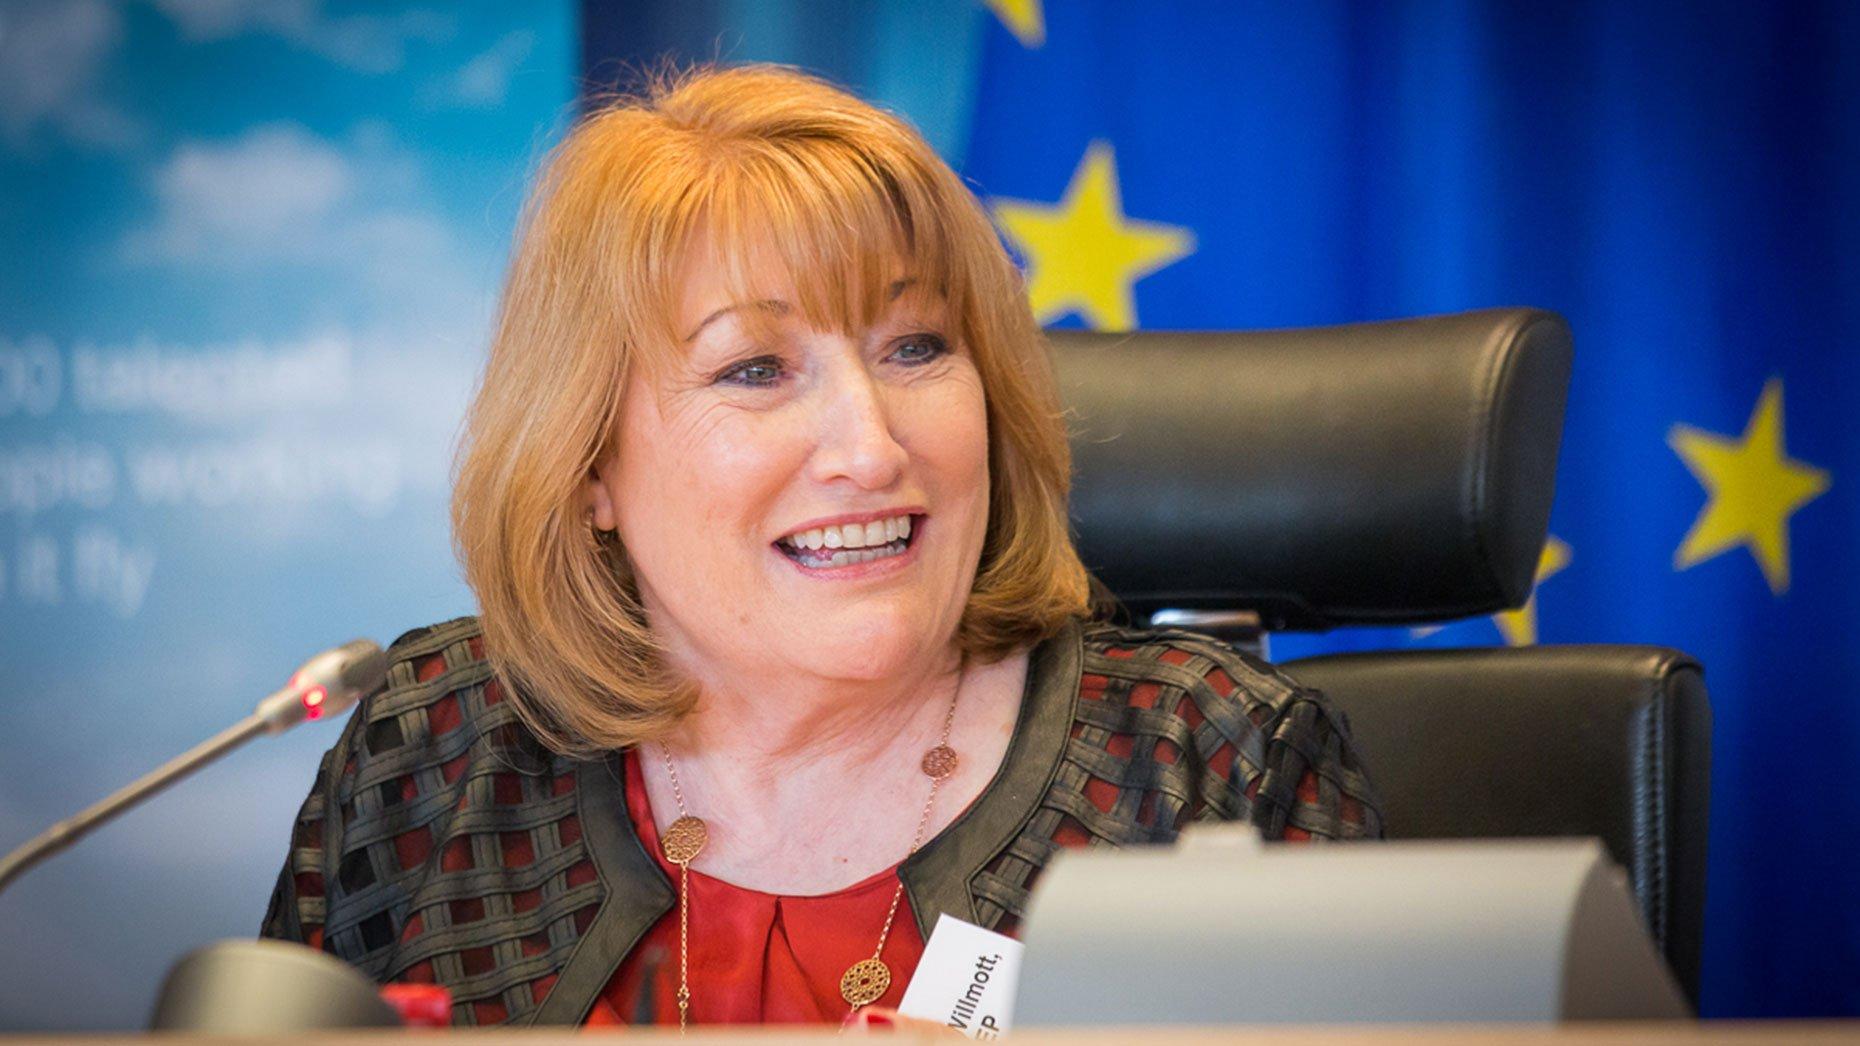 Labour MEP for the East Midlands, Glenis Willmott